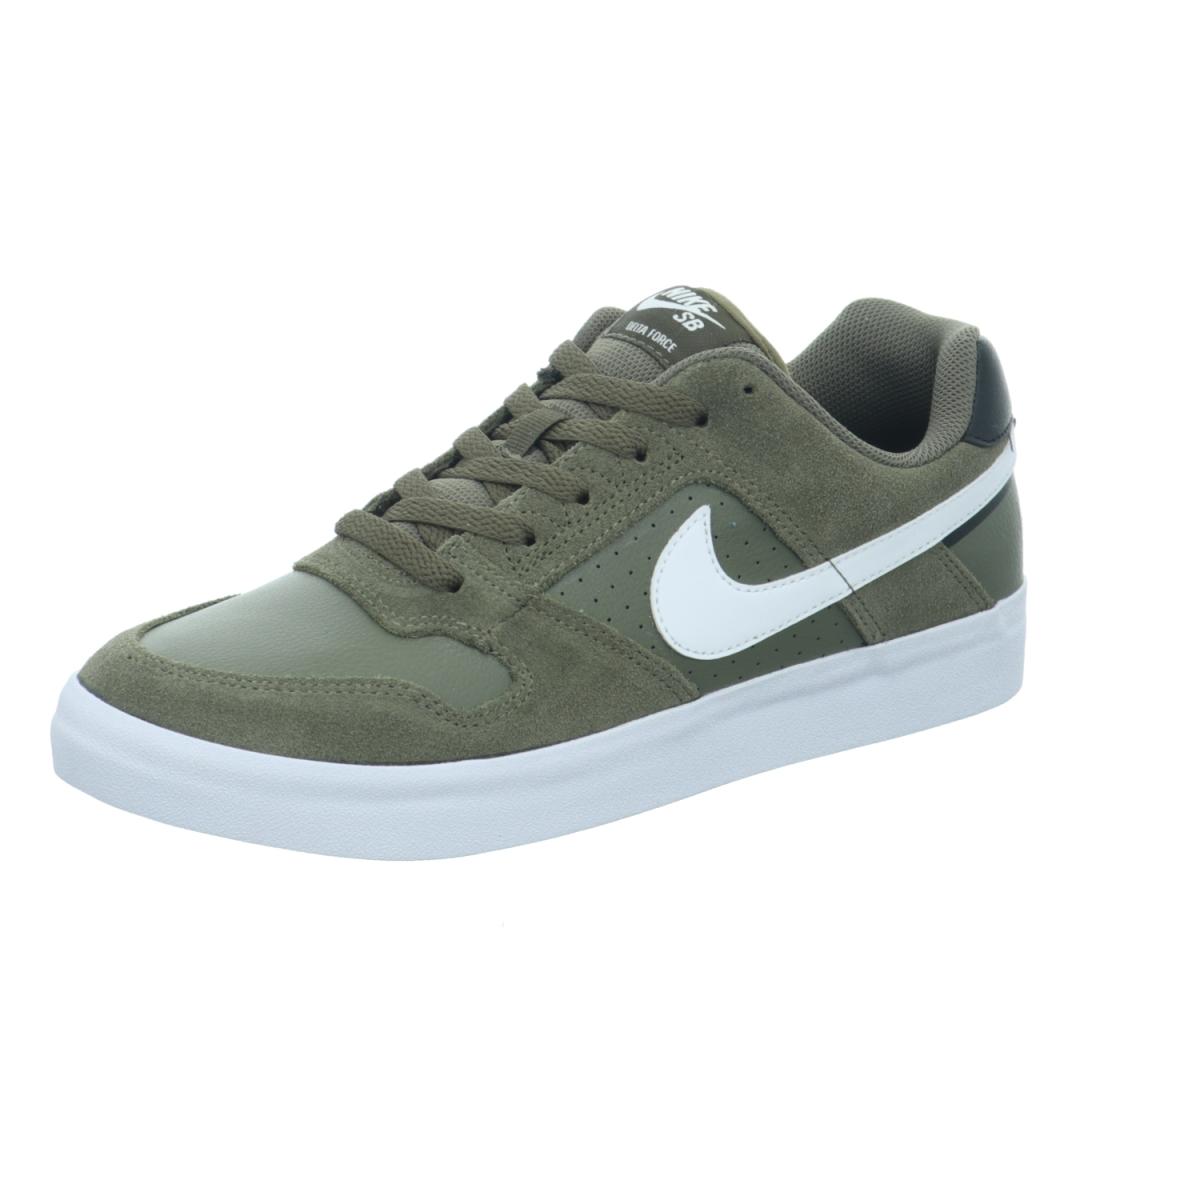 Nike | 942237 200 | Hillenhinrichs-Schuhmode.de